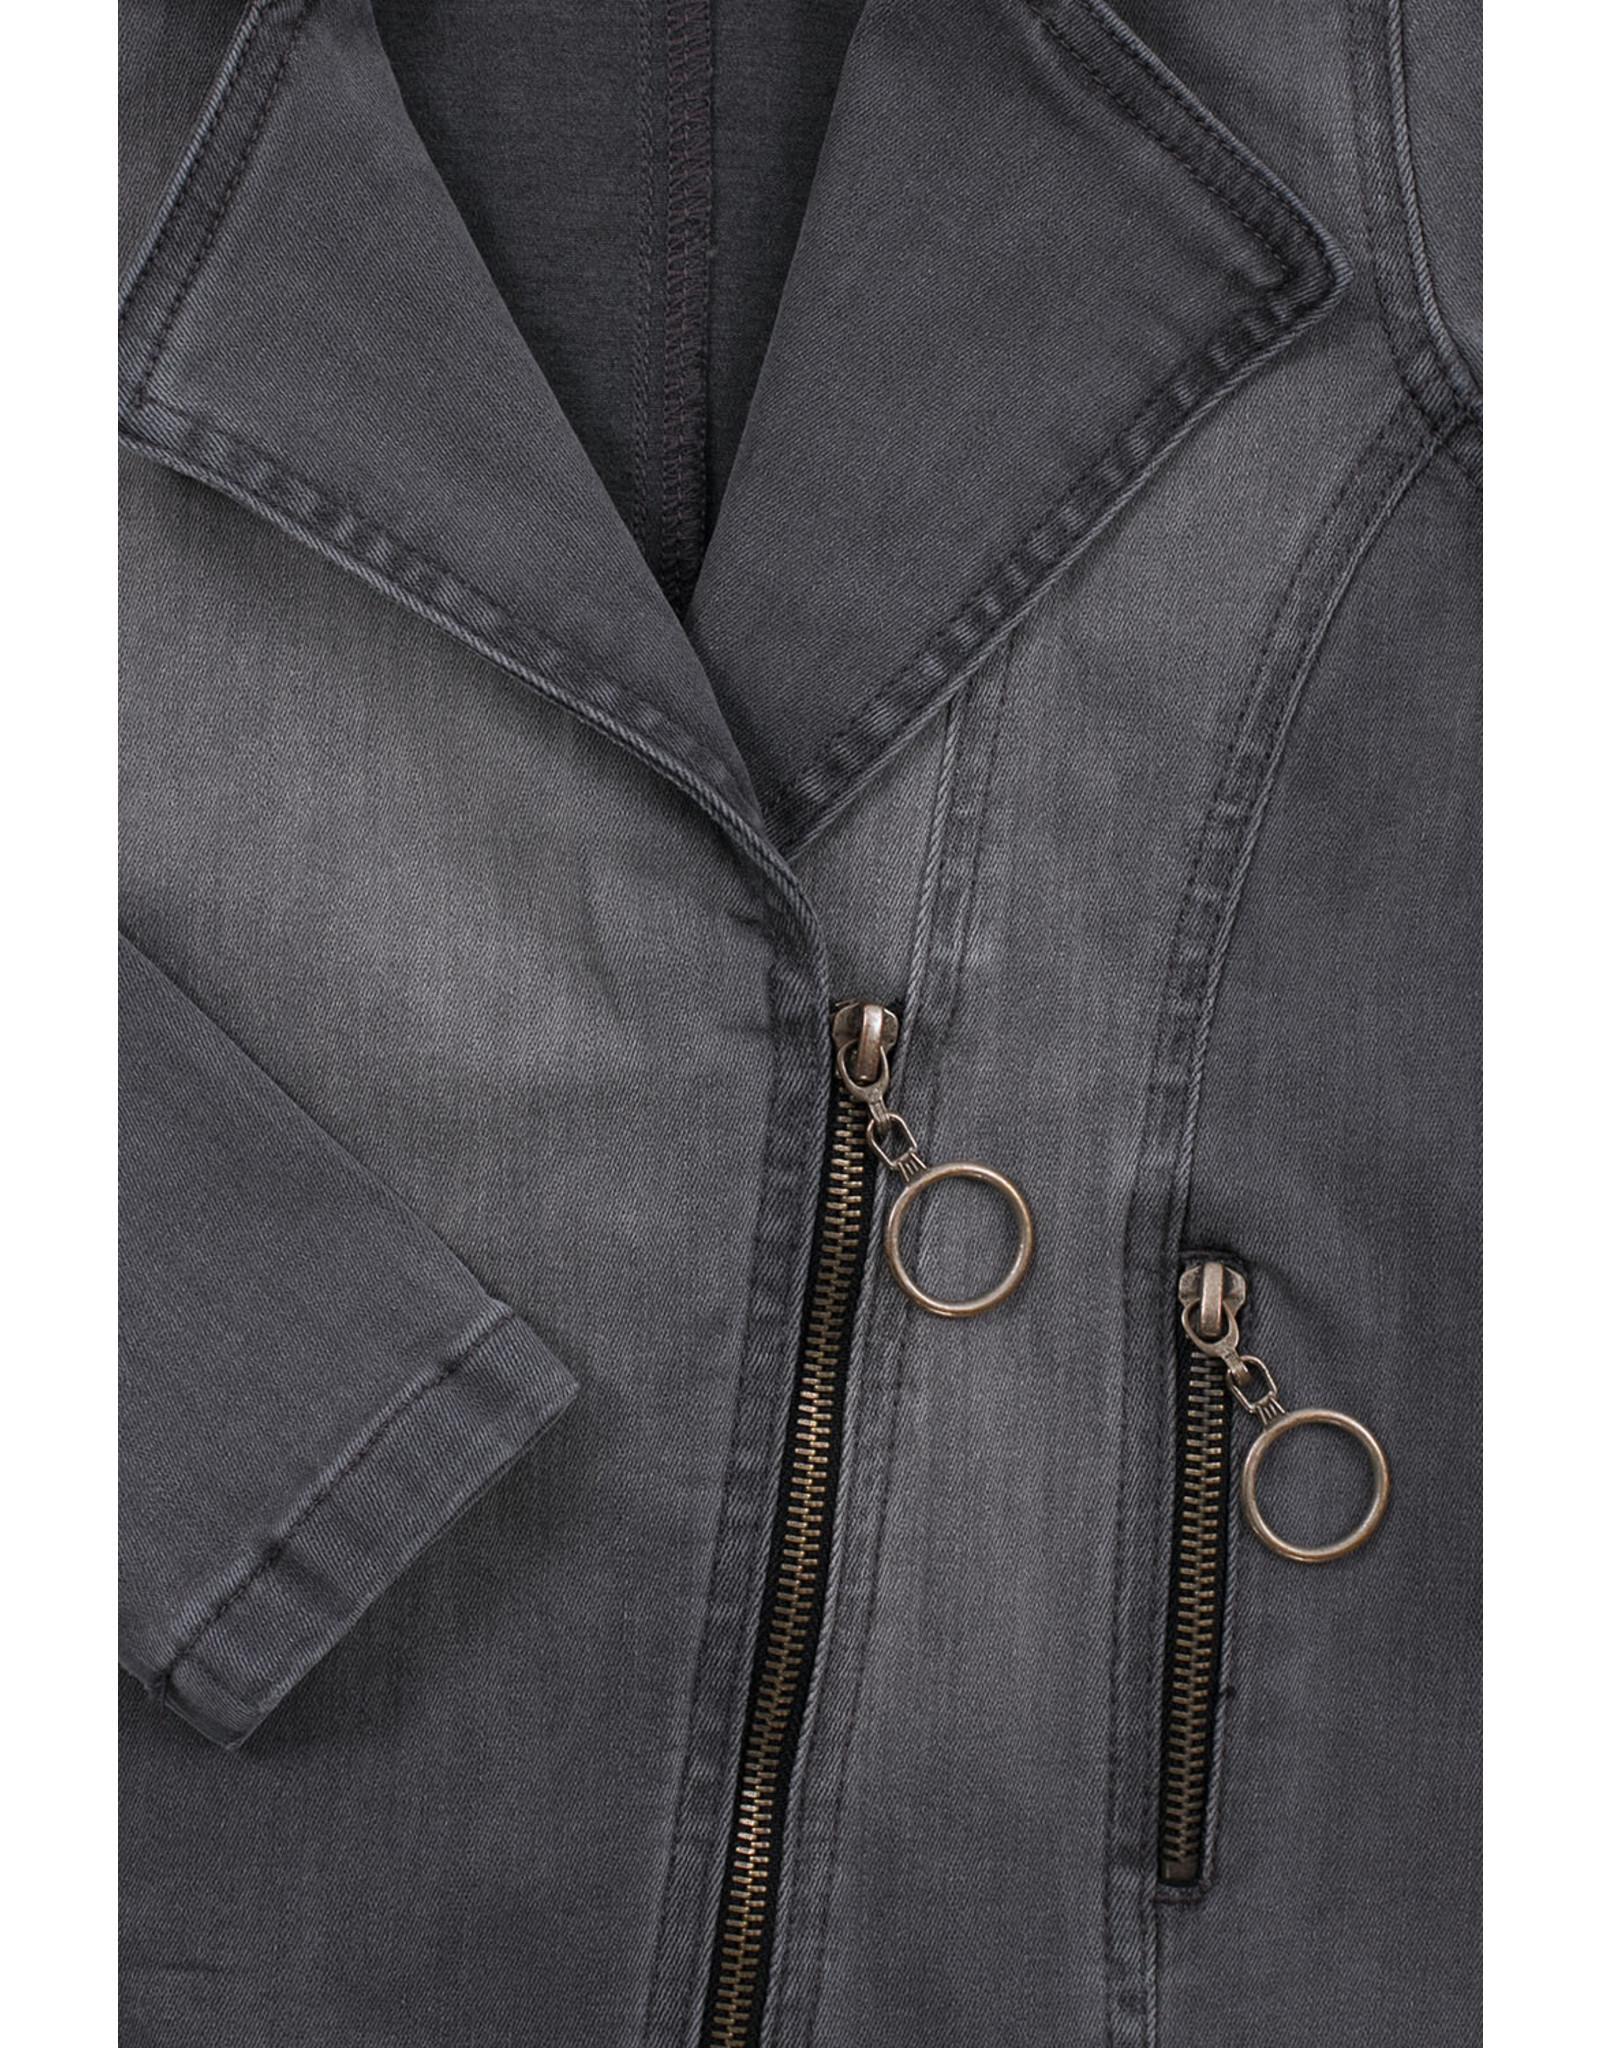 LOOXS 10sixteen biker jacket soft grey SOFT GREY